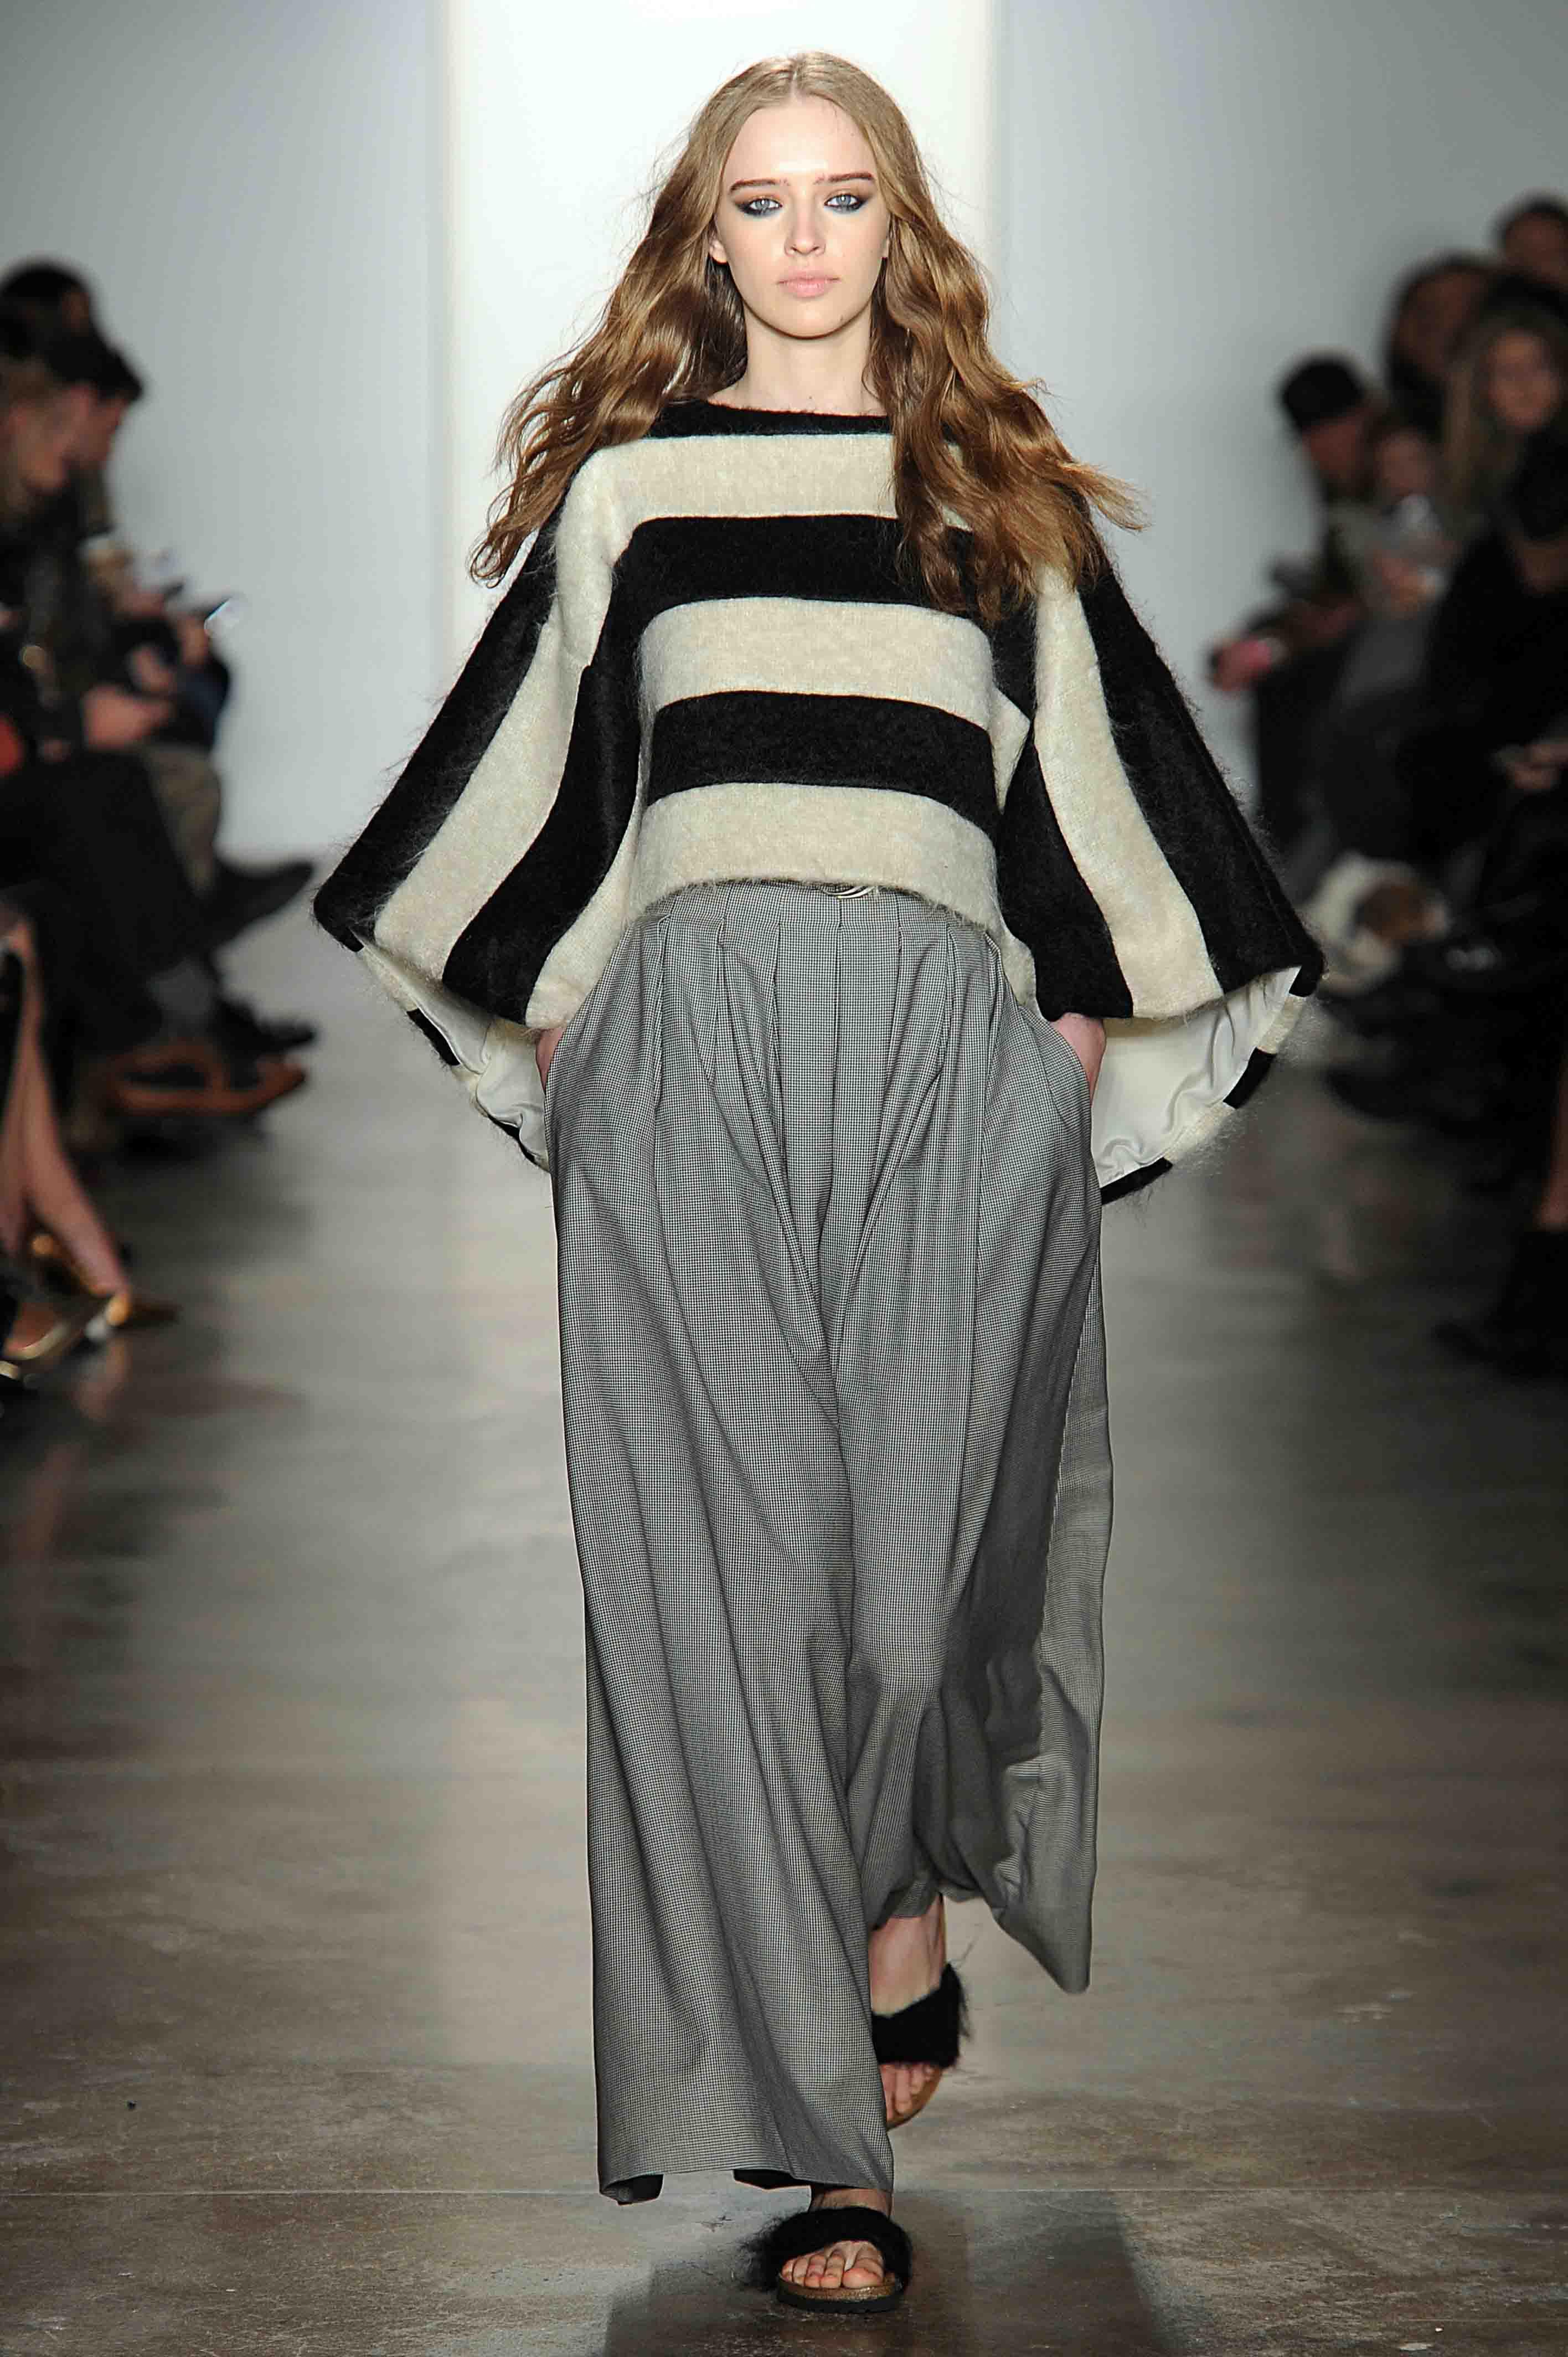 Houghton Womenswear Fall Winter 2014 New York Fashion Week February 2014